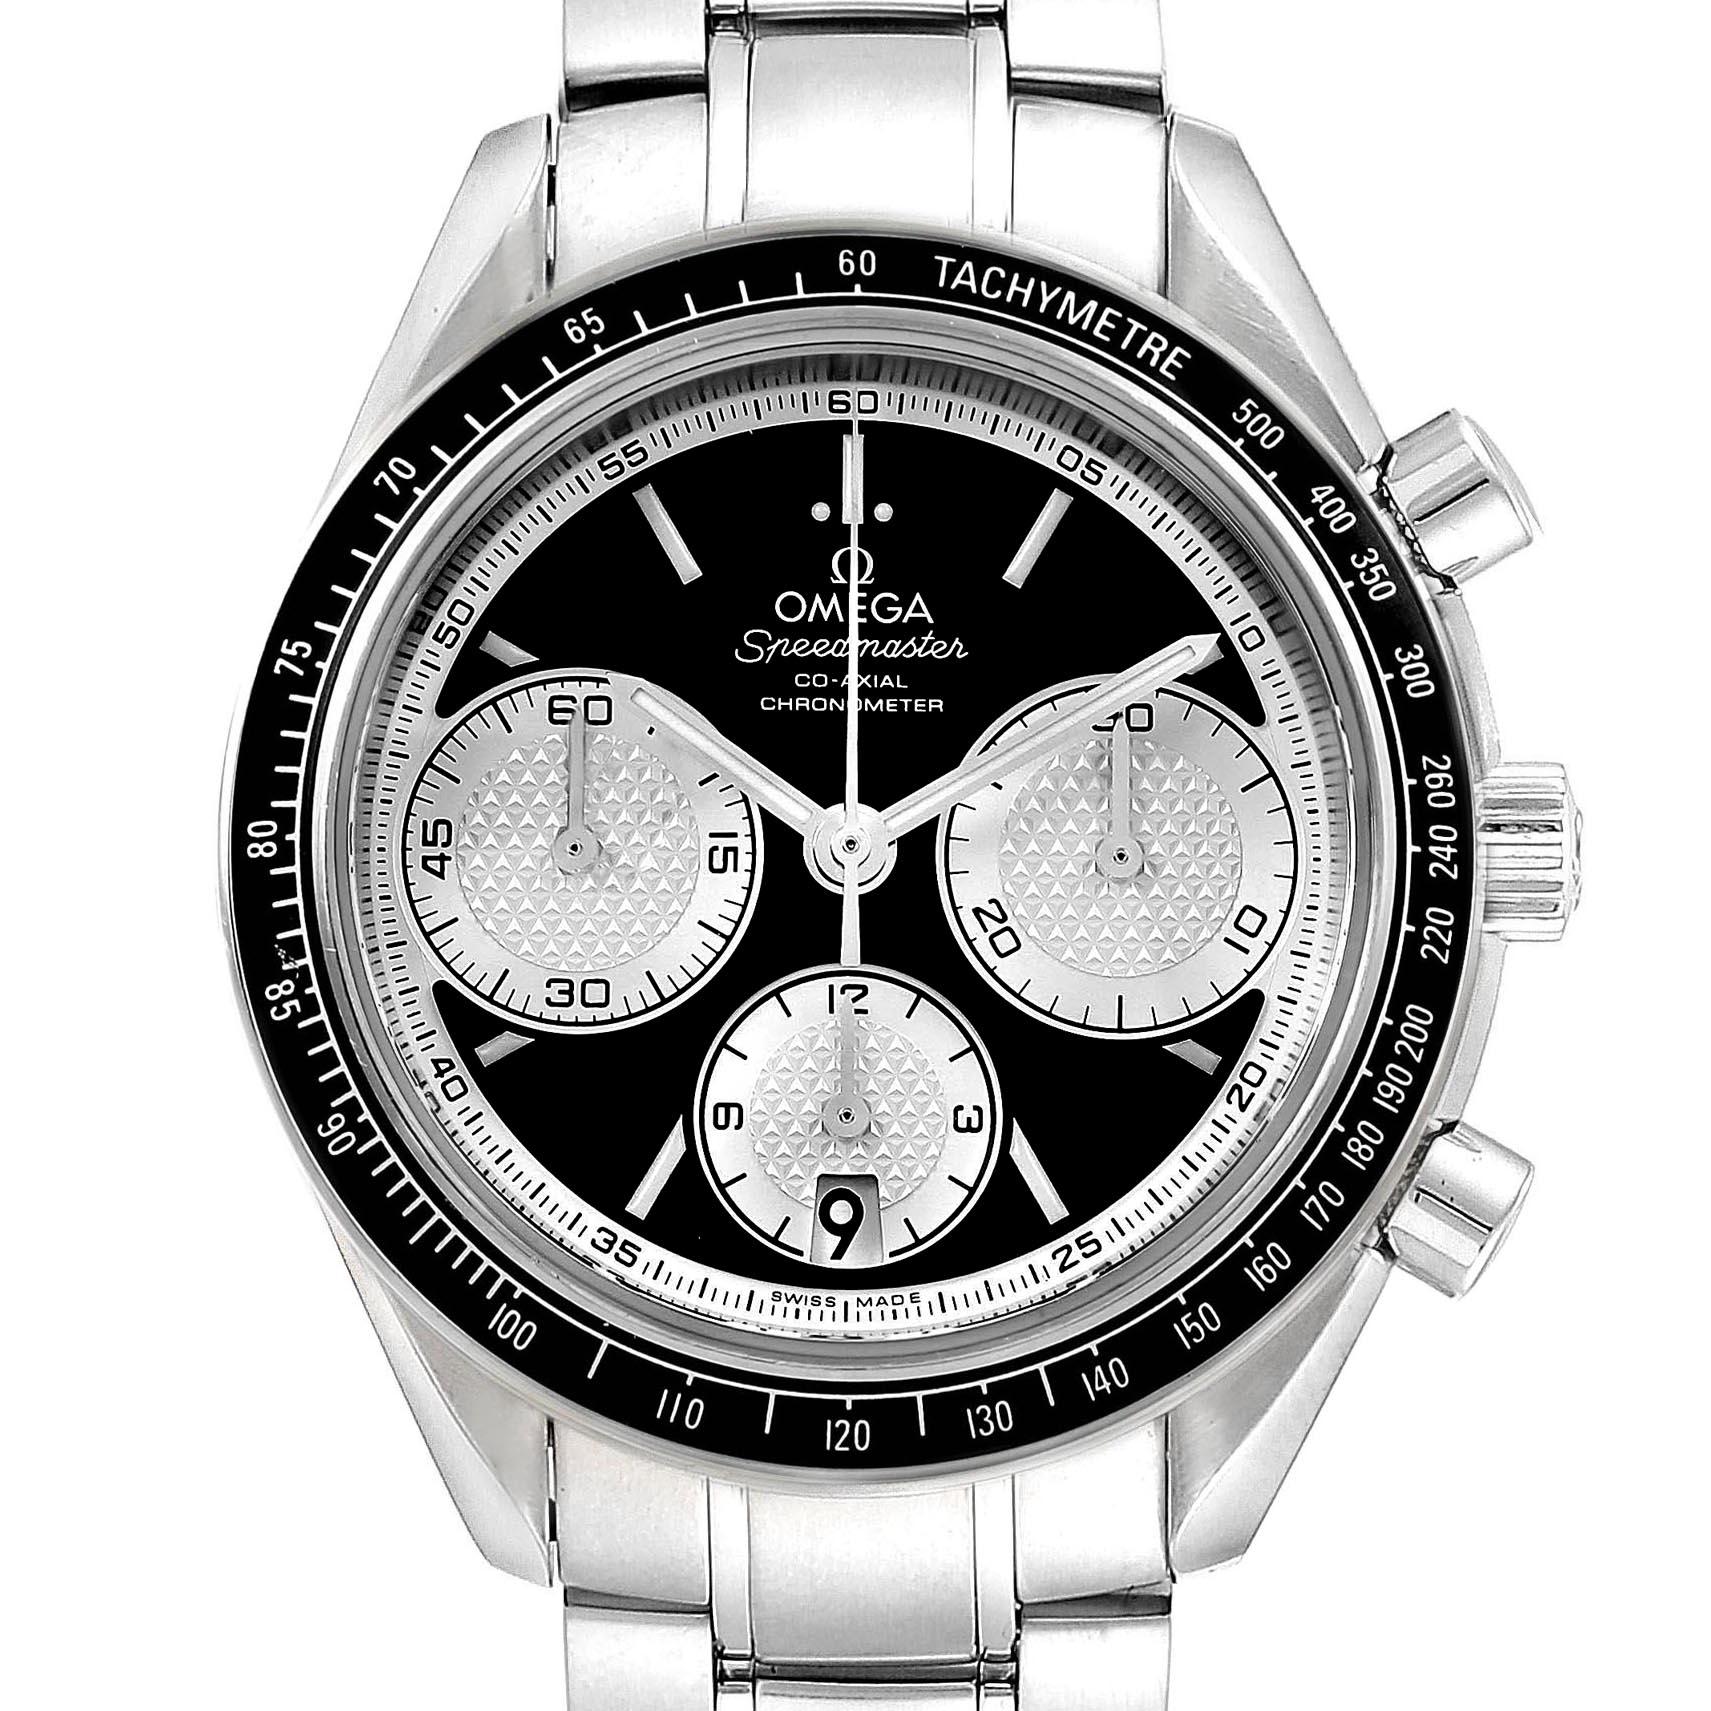 Omega Speedmaster Racing Inverted Panda Dial Watch 326.30.40.50.01.002